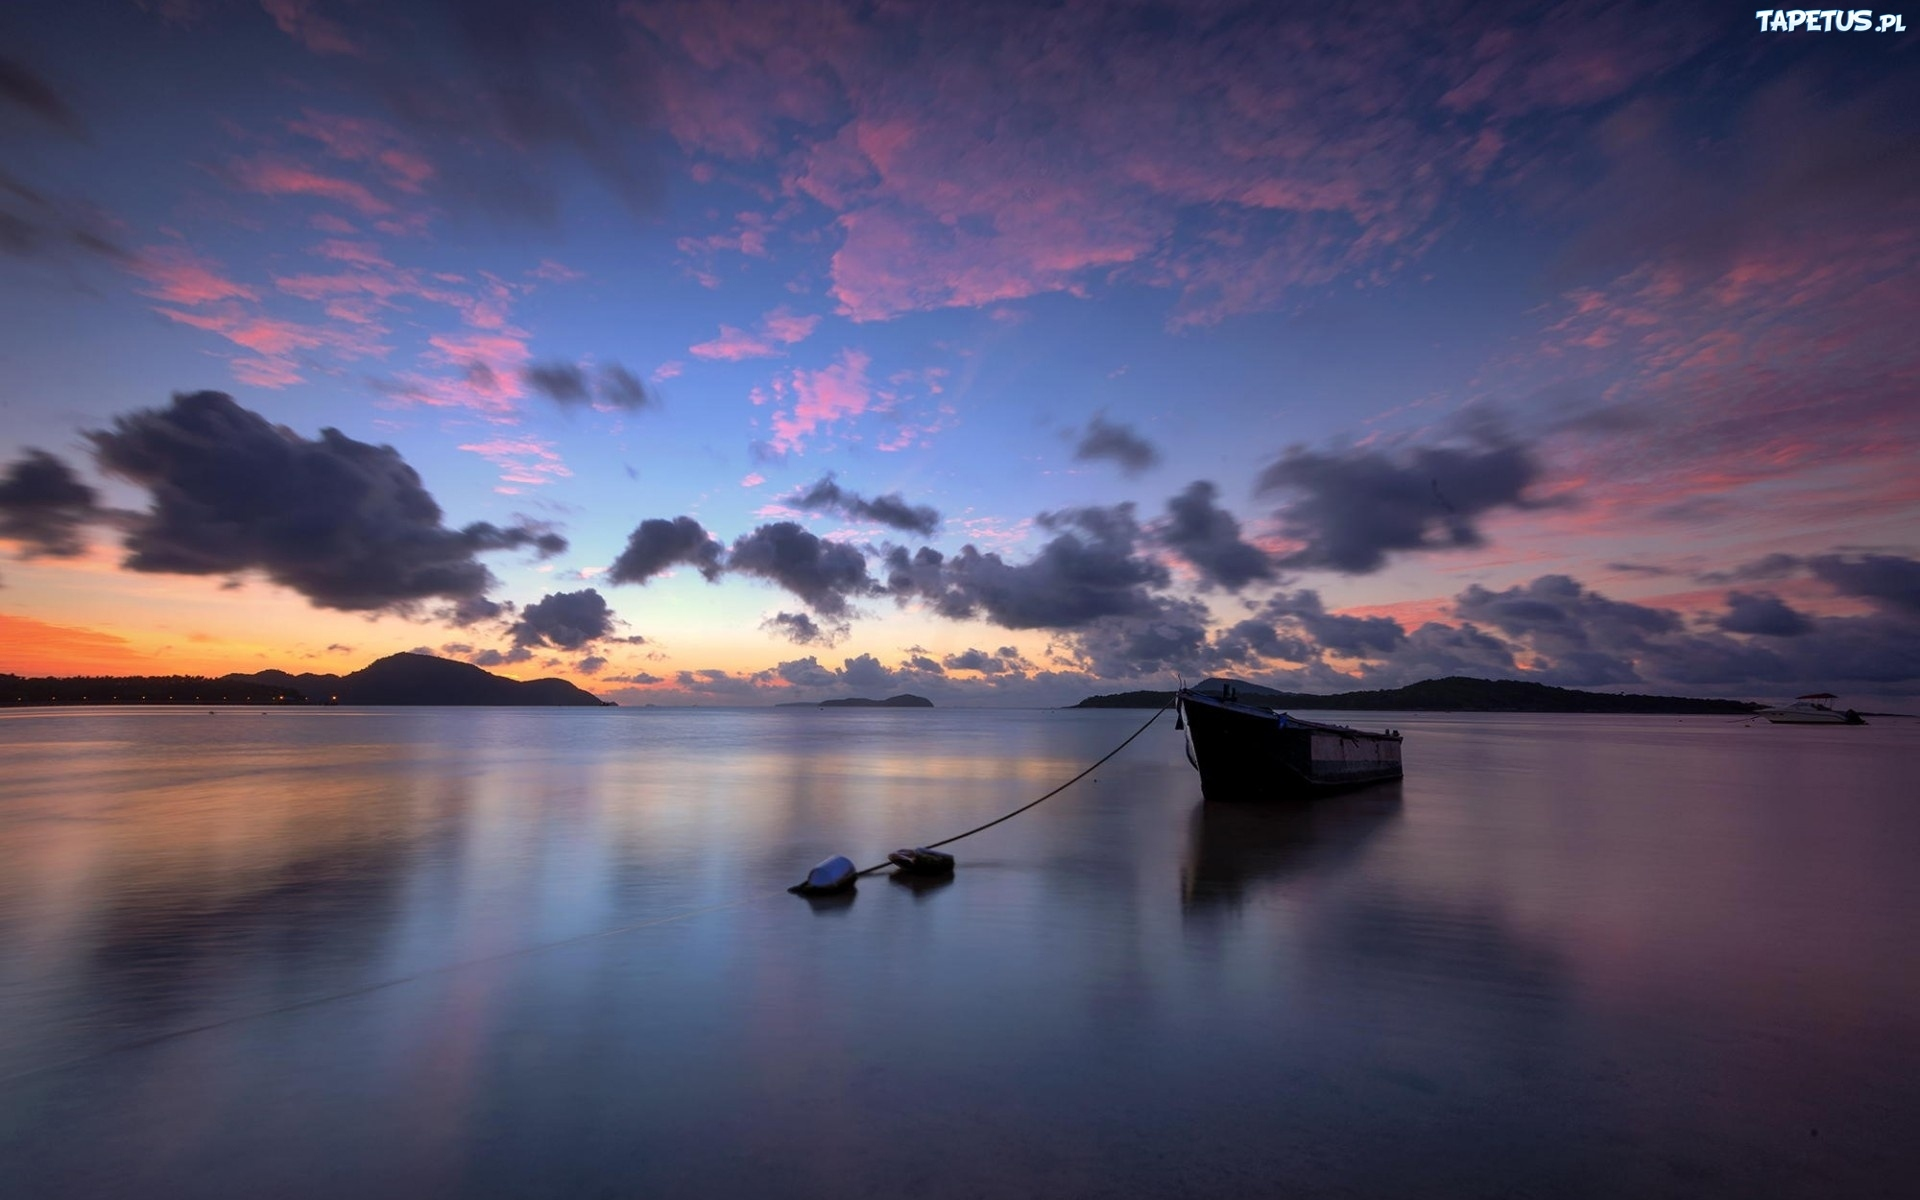 3840x2400 wallpaper ocean boat - photo #3